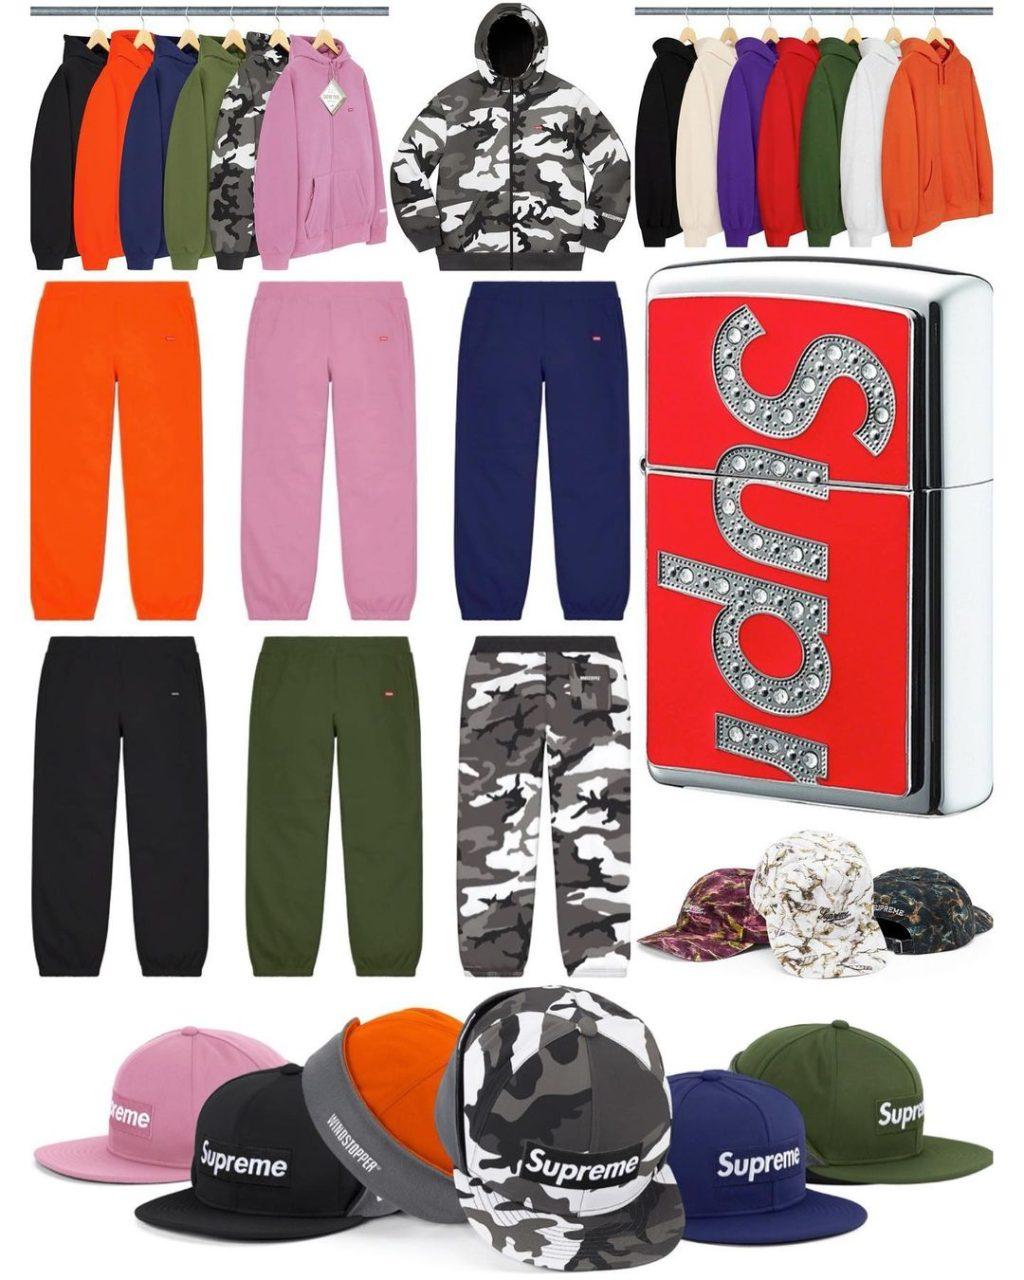 supreme-online-store-20201226-week18-release-items